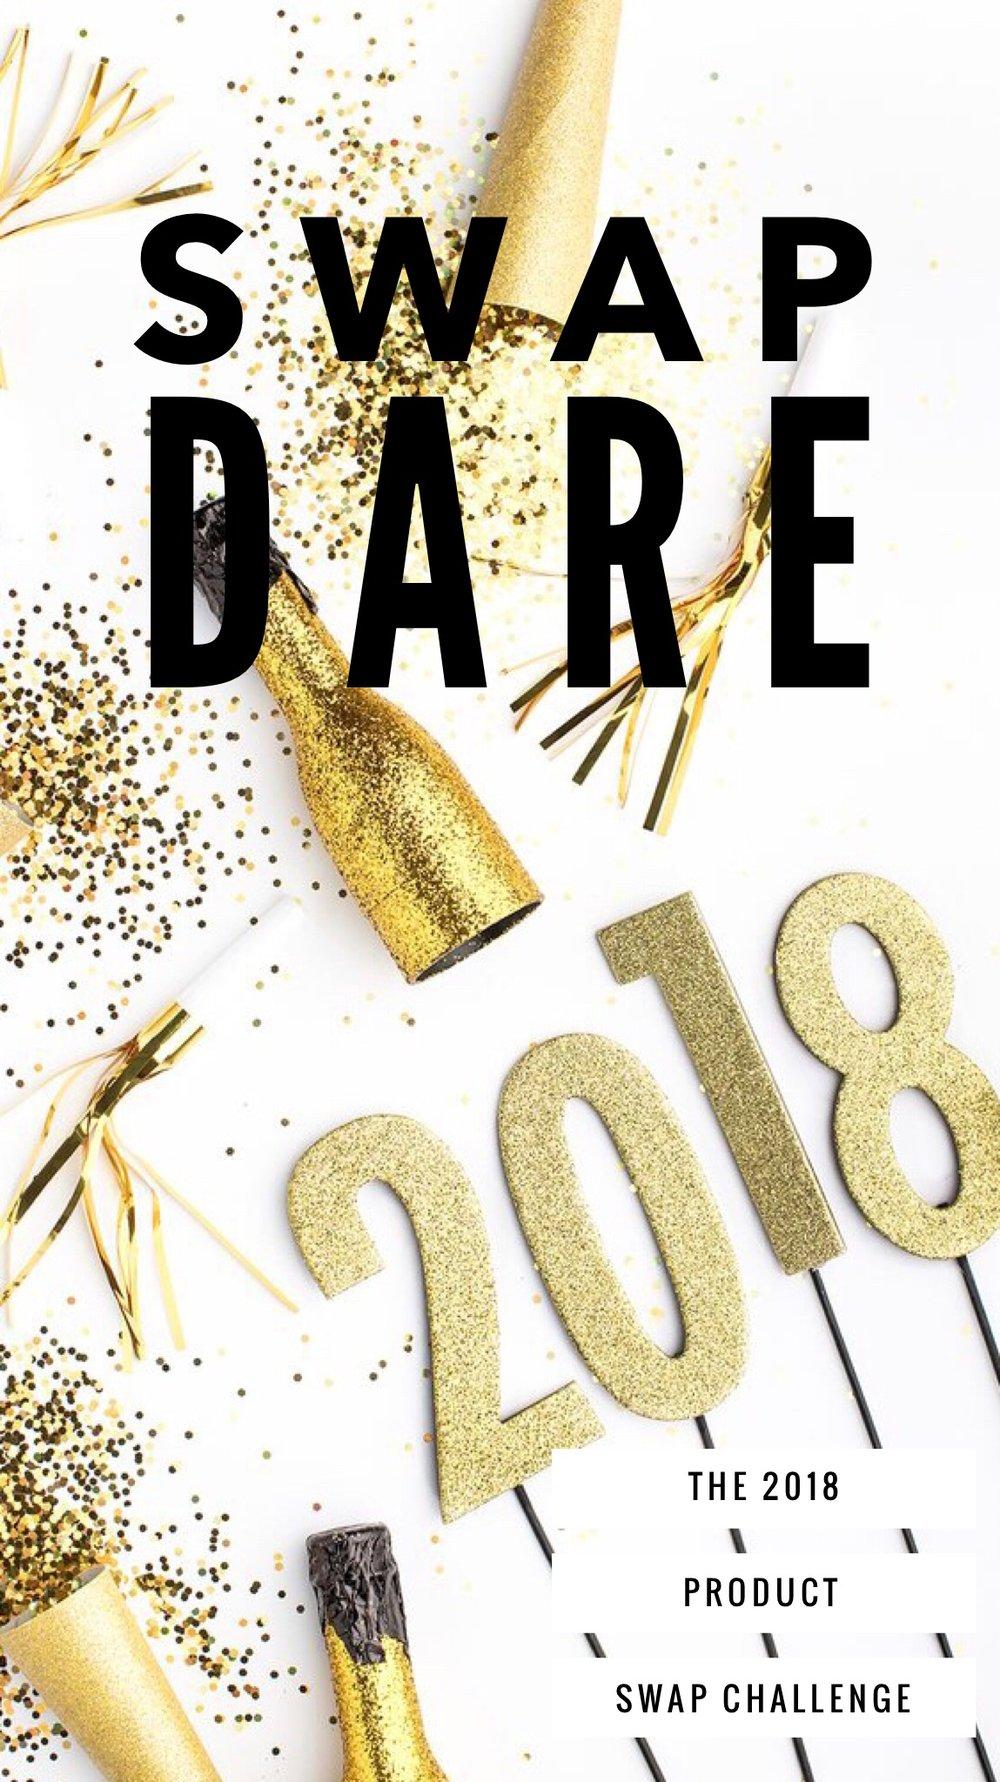 2018 Swap Dare